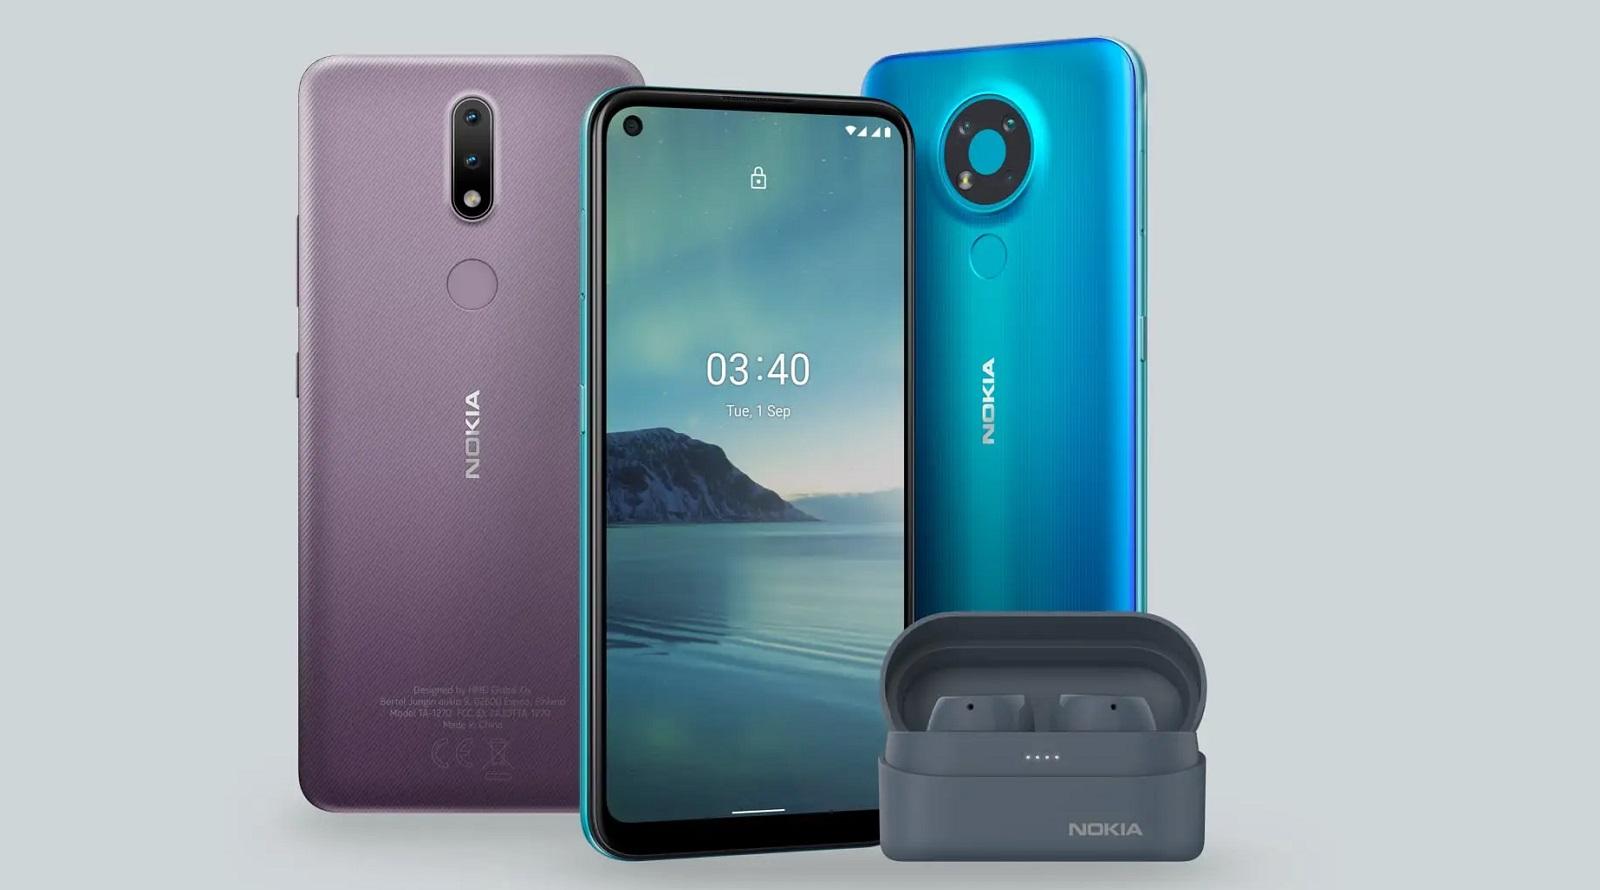 New Nokia smartphones launched - including the Nokia 8.3 5G - Gearburn - gearburn